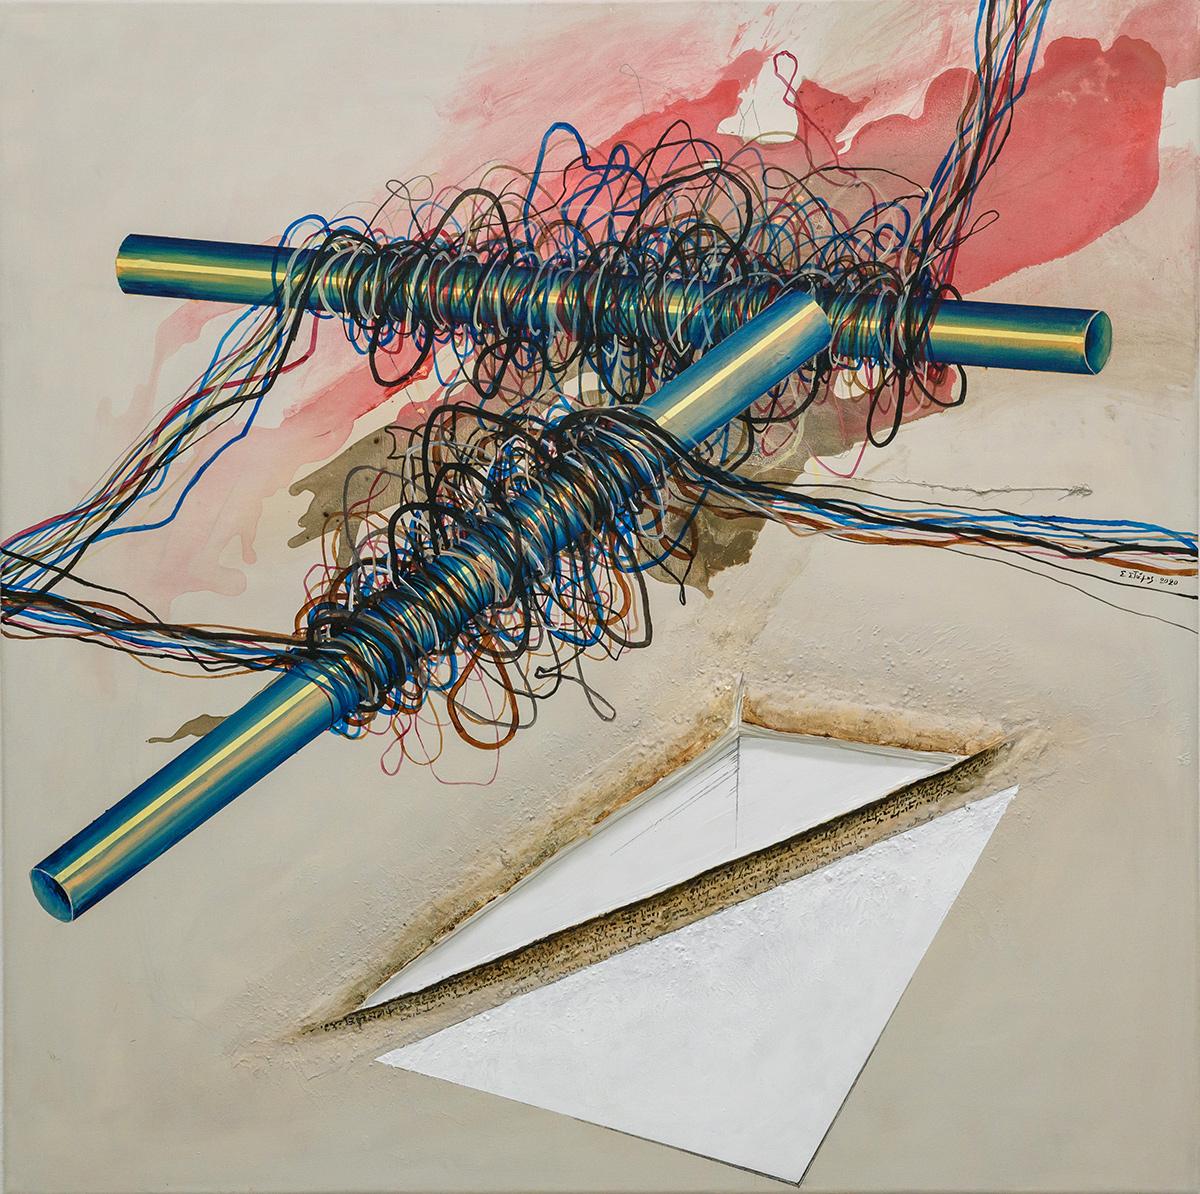 Untitled, Acrylics, cloth, porcelain on canvas, 100 x 100 cm, 2019, Trikala